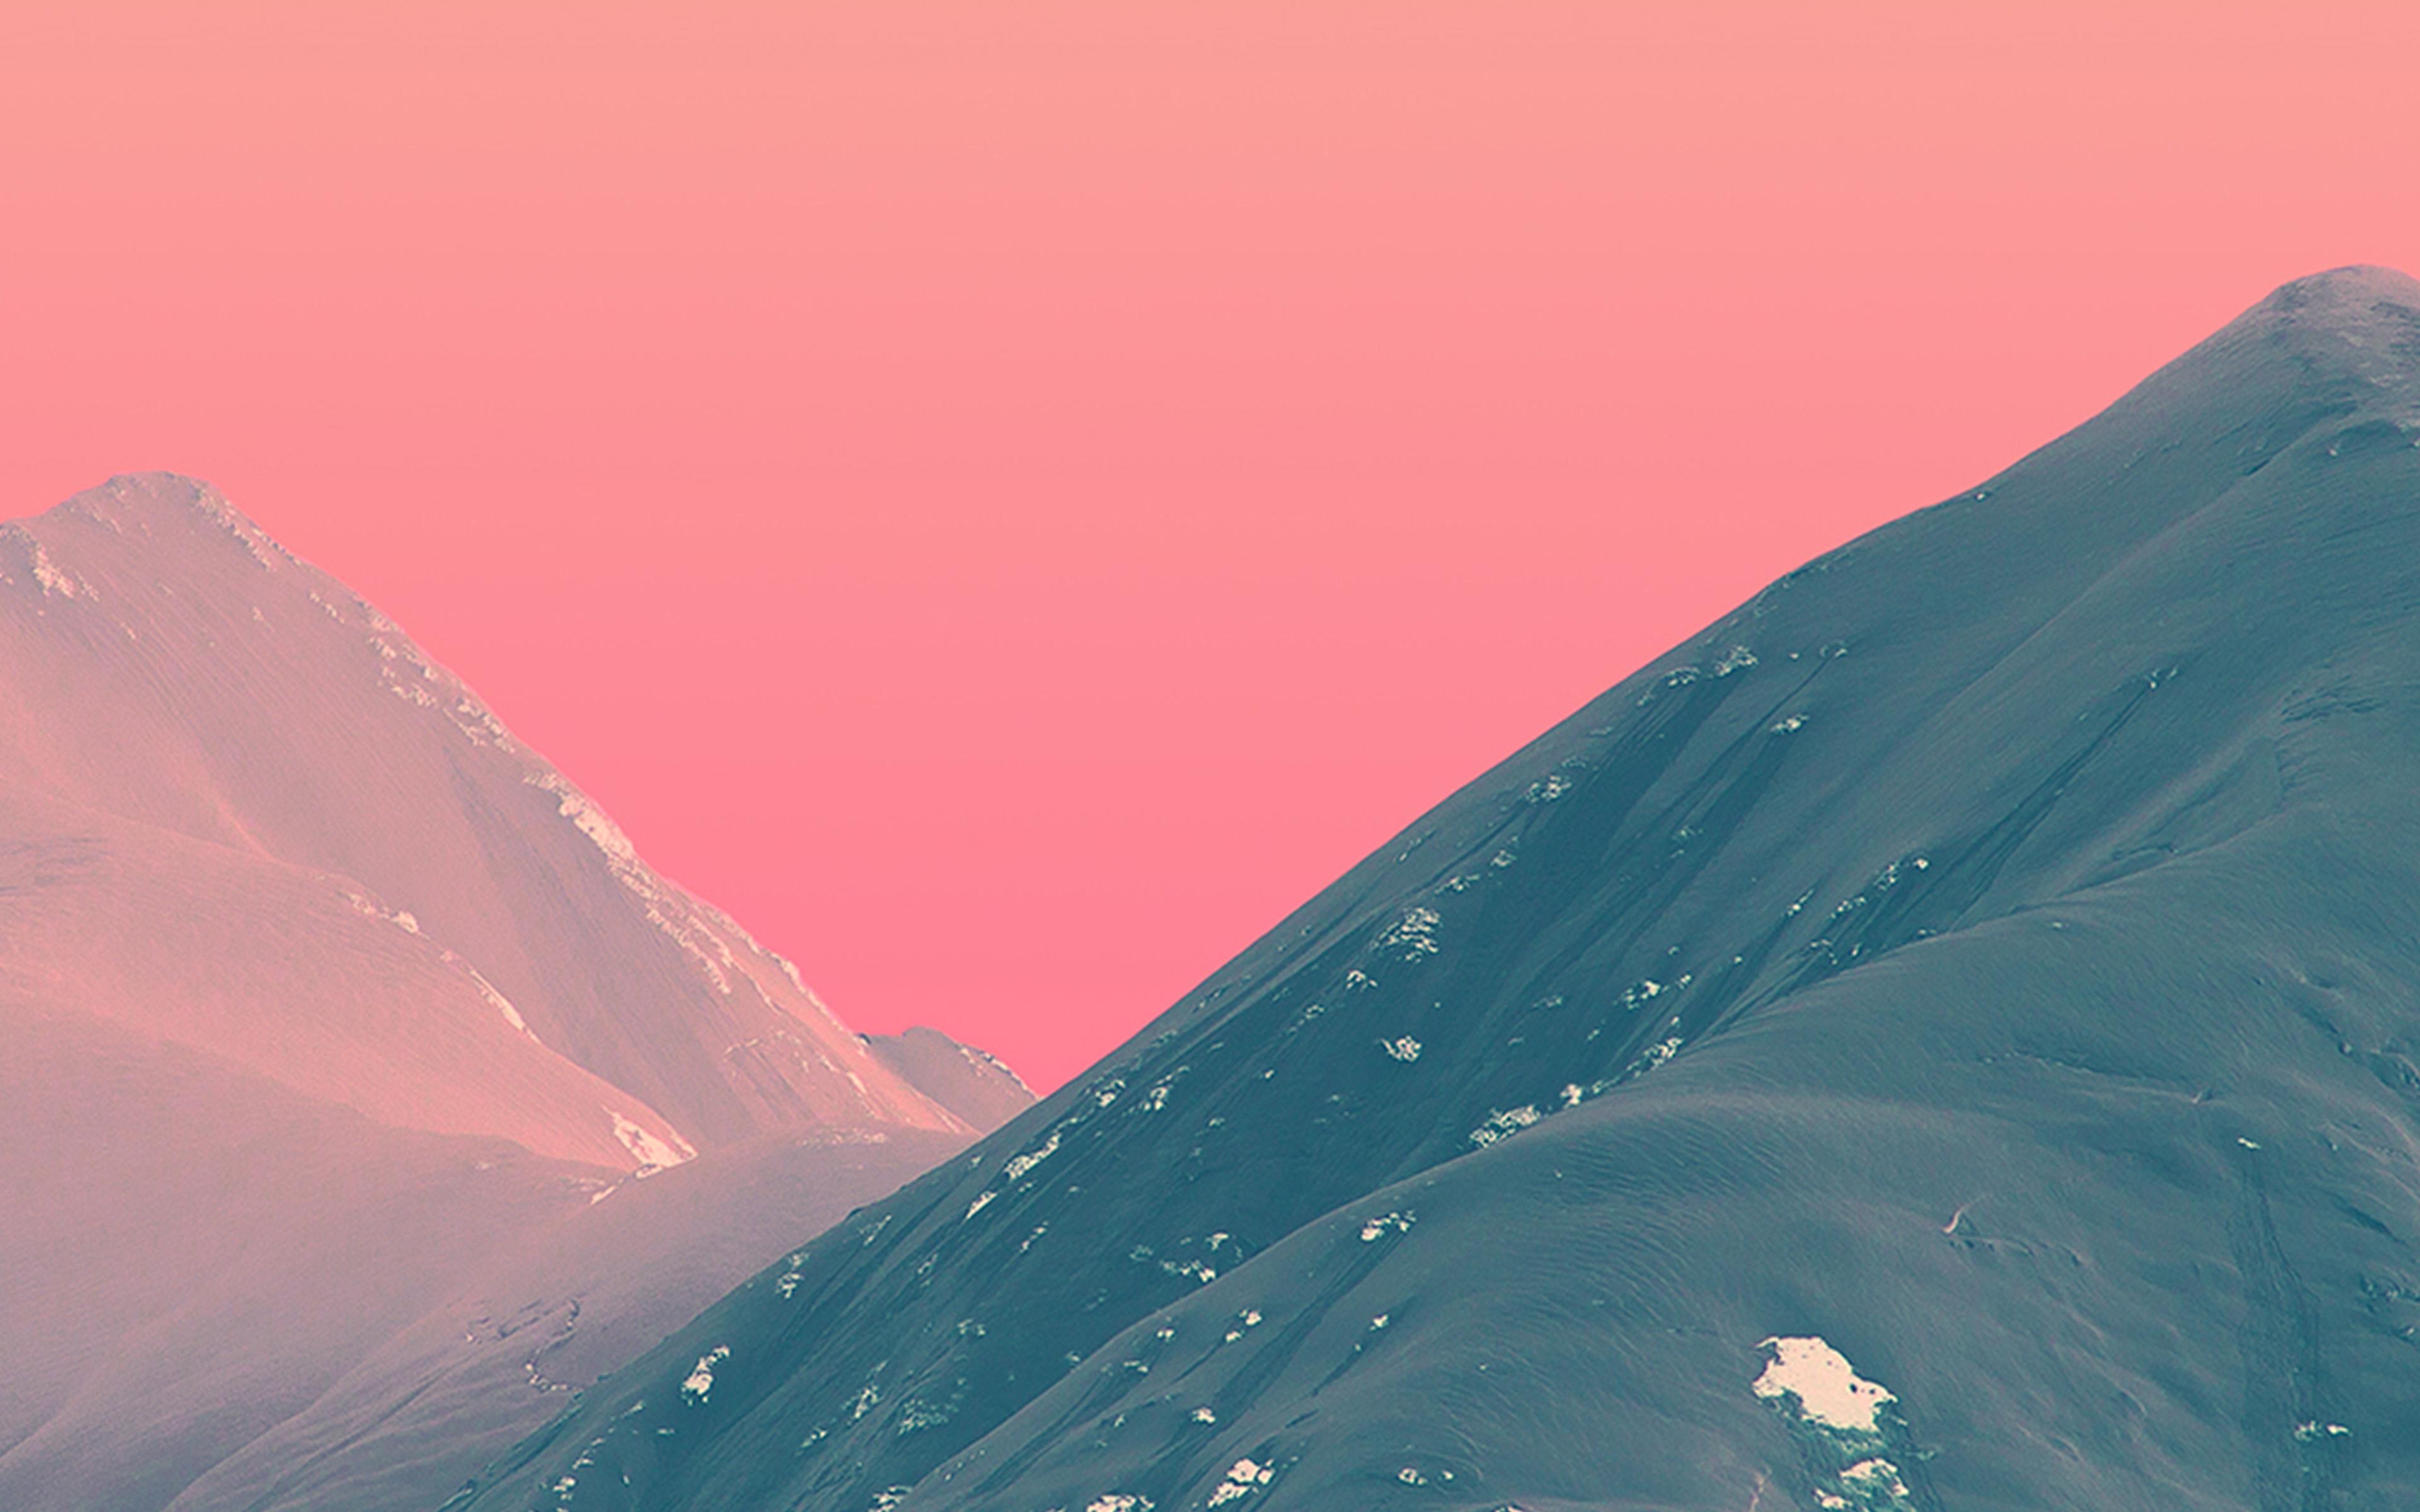 wallpaper for desktop, laptop   bf71-mountain-pink-nature-art